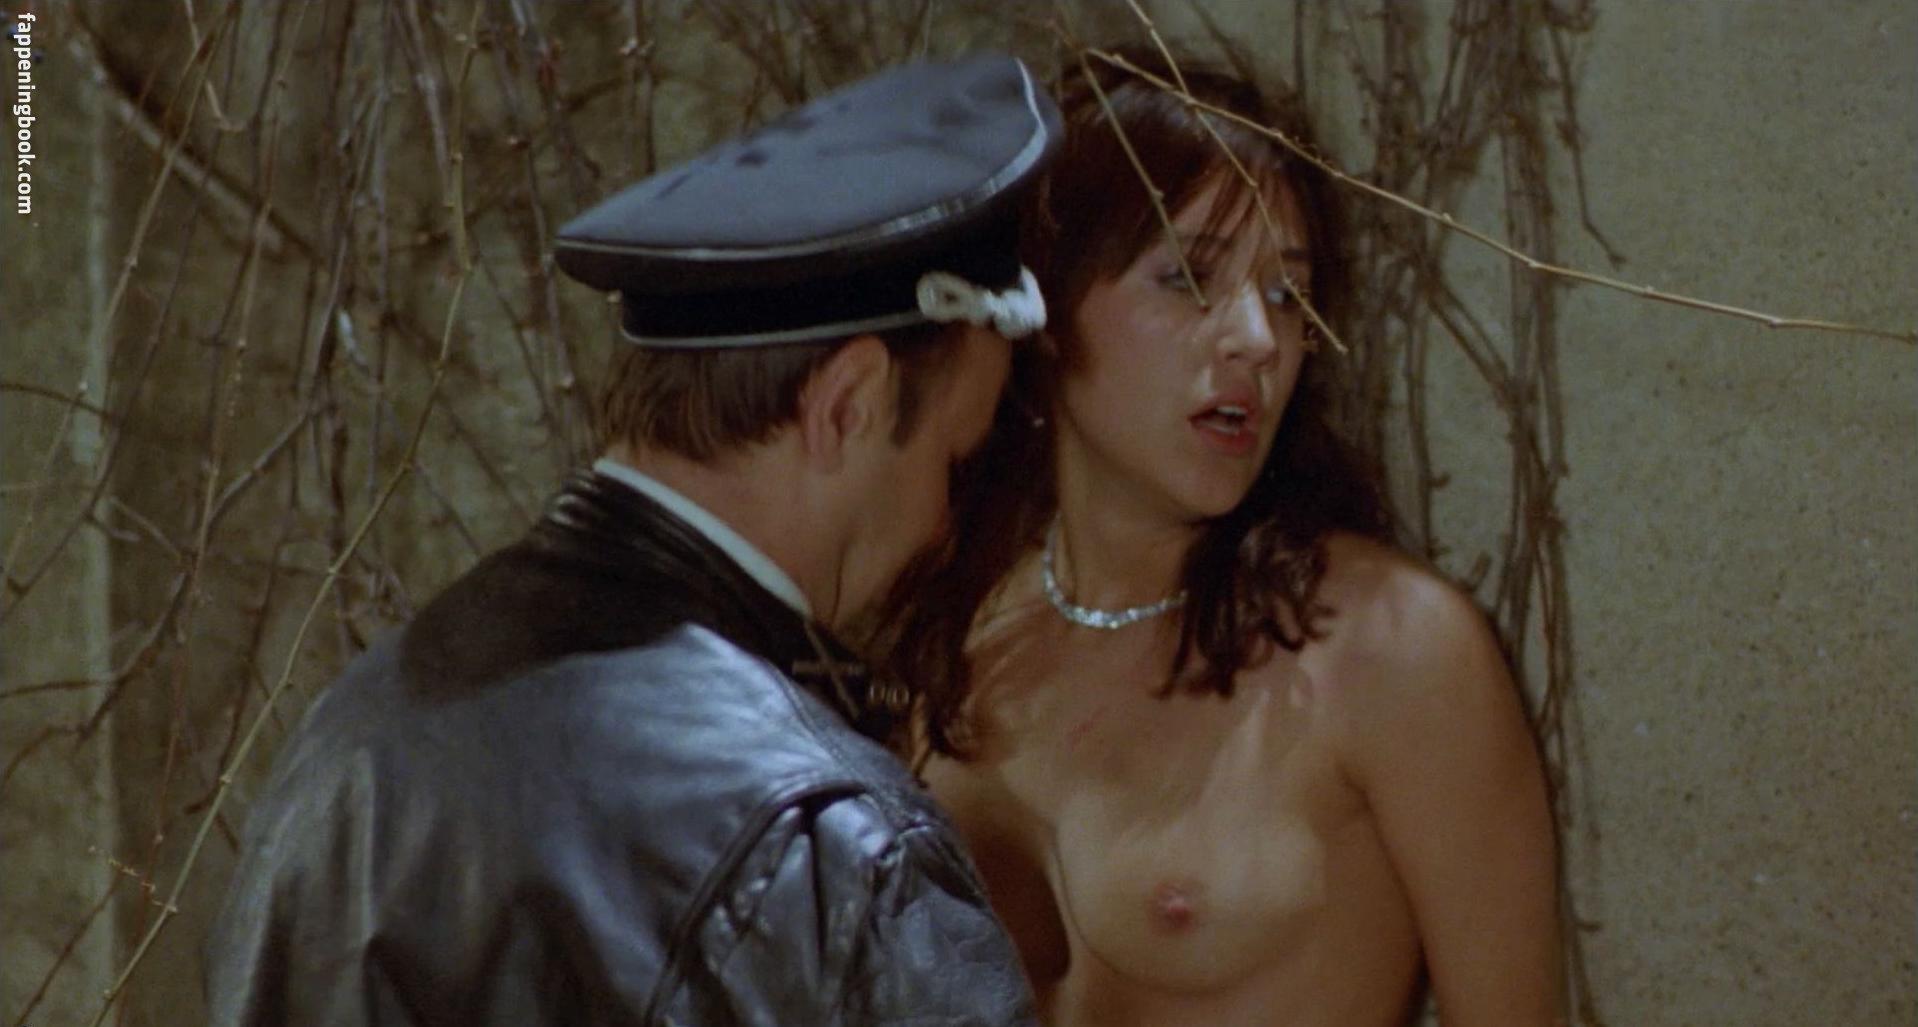 Andrea Naakt andrea albani nude, sexy, the fappening, uncensored - photo